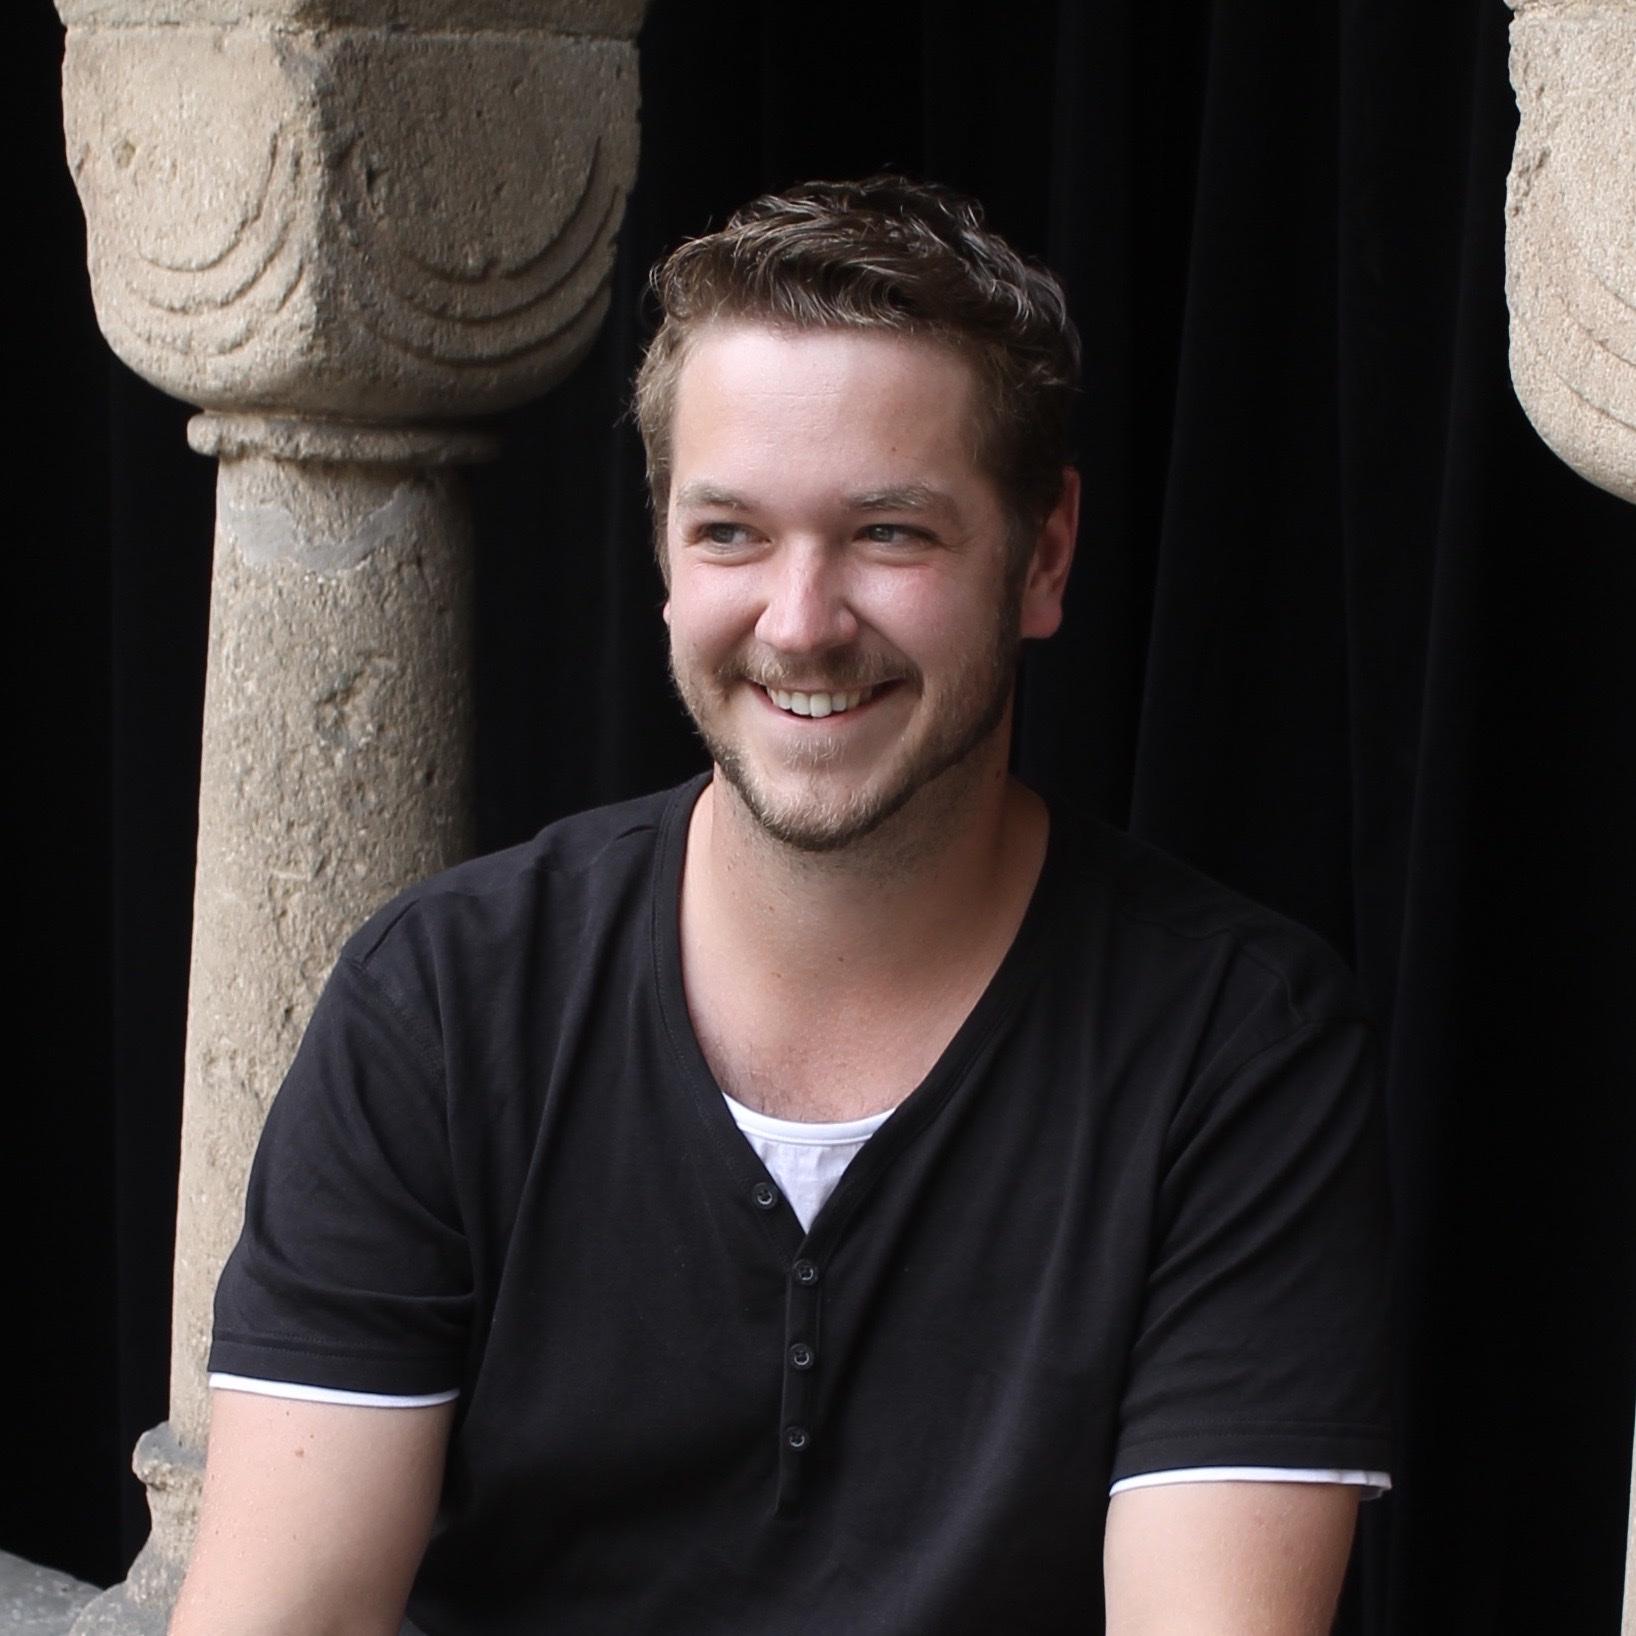 Stephan Vanecek